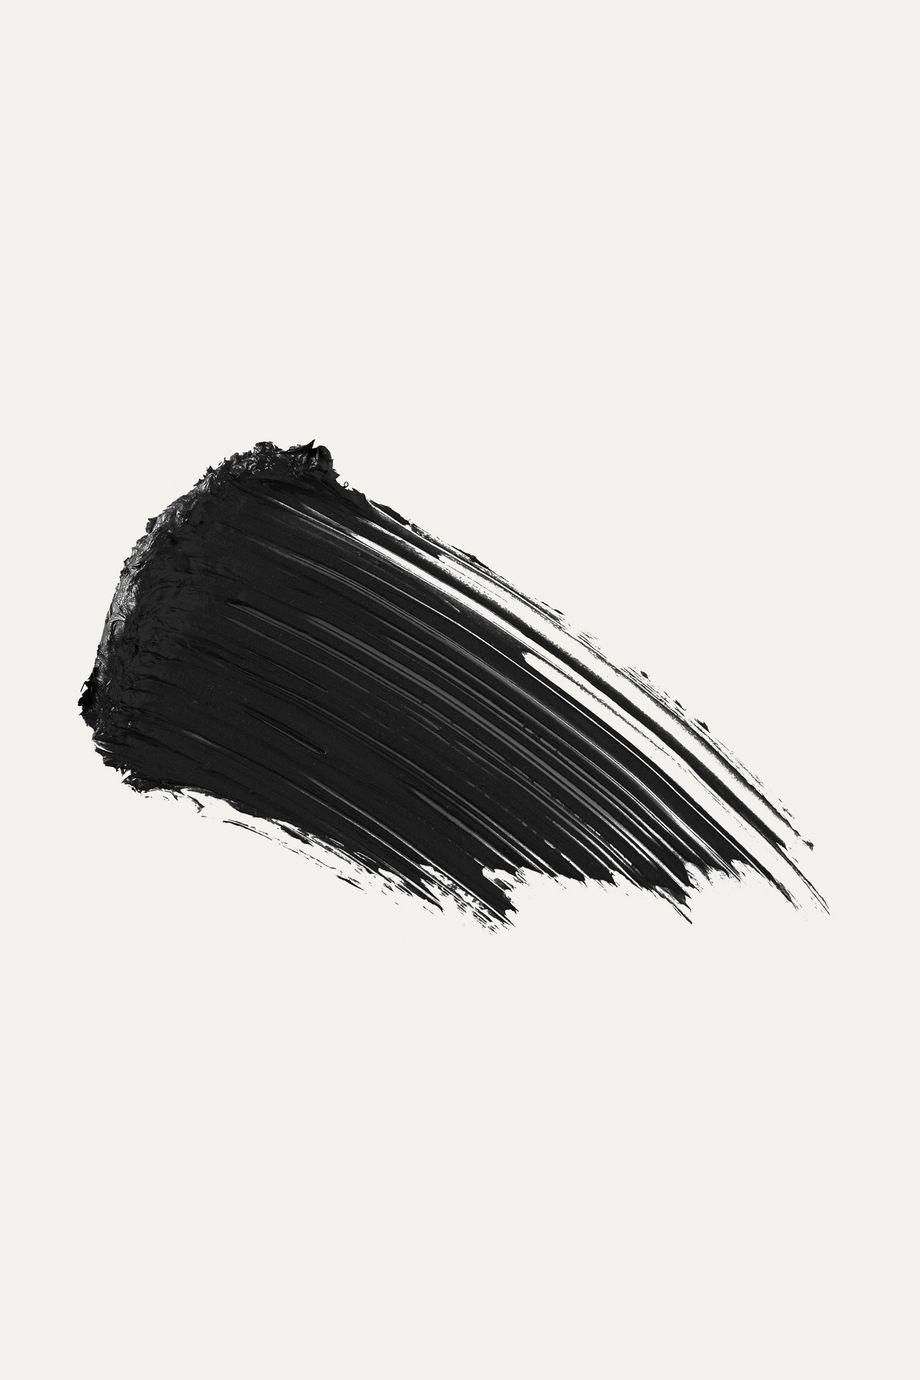 Marc Jacobs Beauty 丝绒浓黑睫毛膏(色号:Noir)